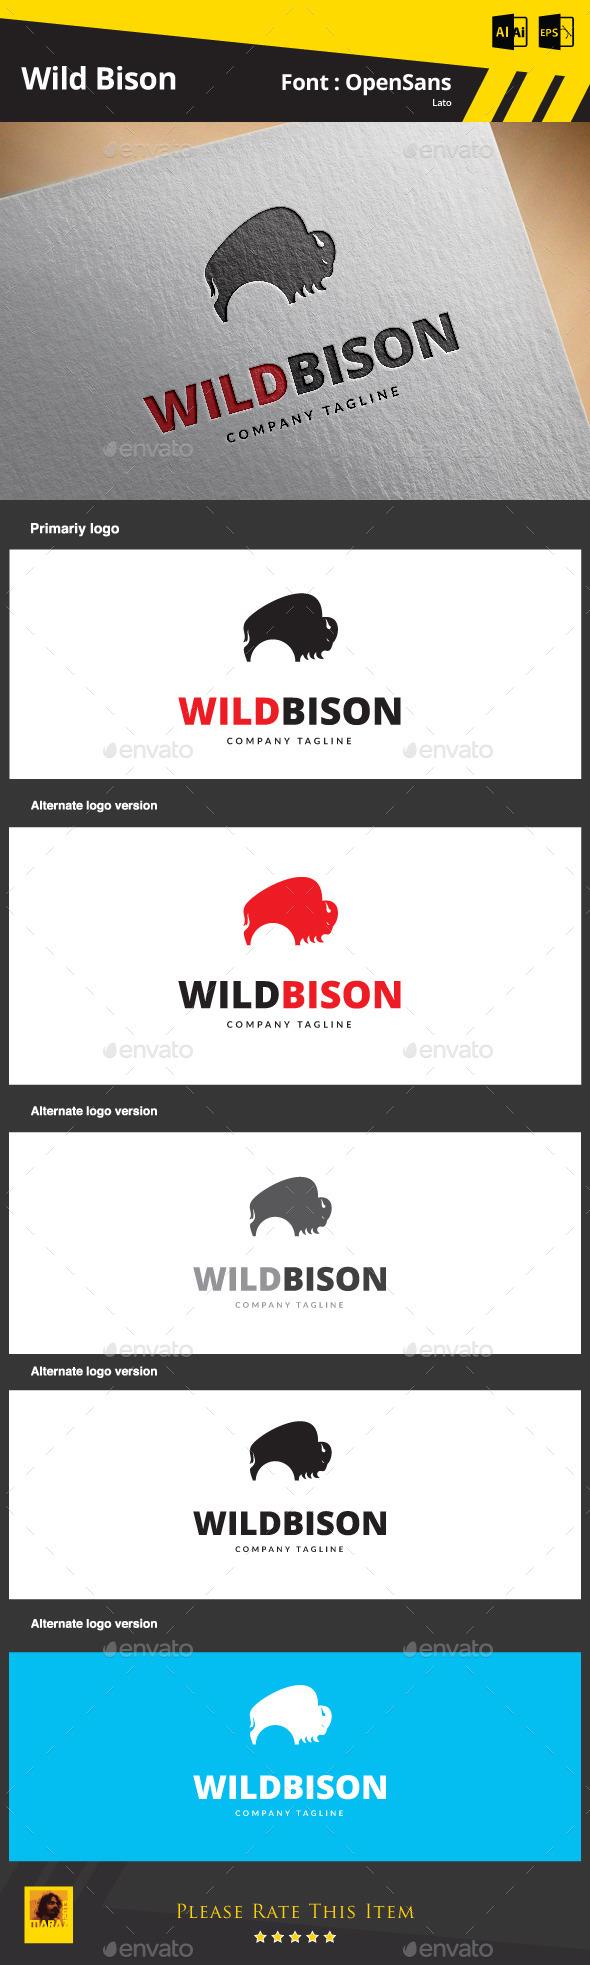 GraphicRiver Wild Bison 9192735